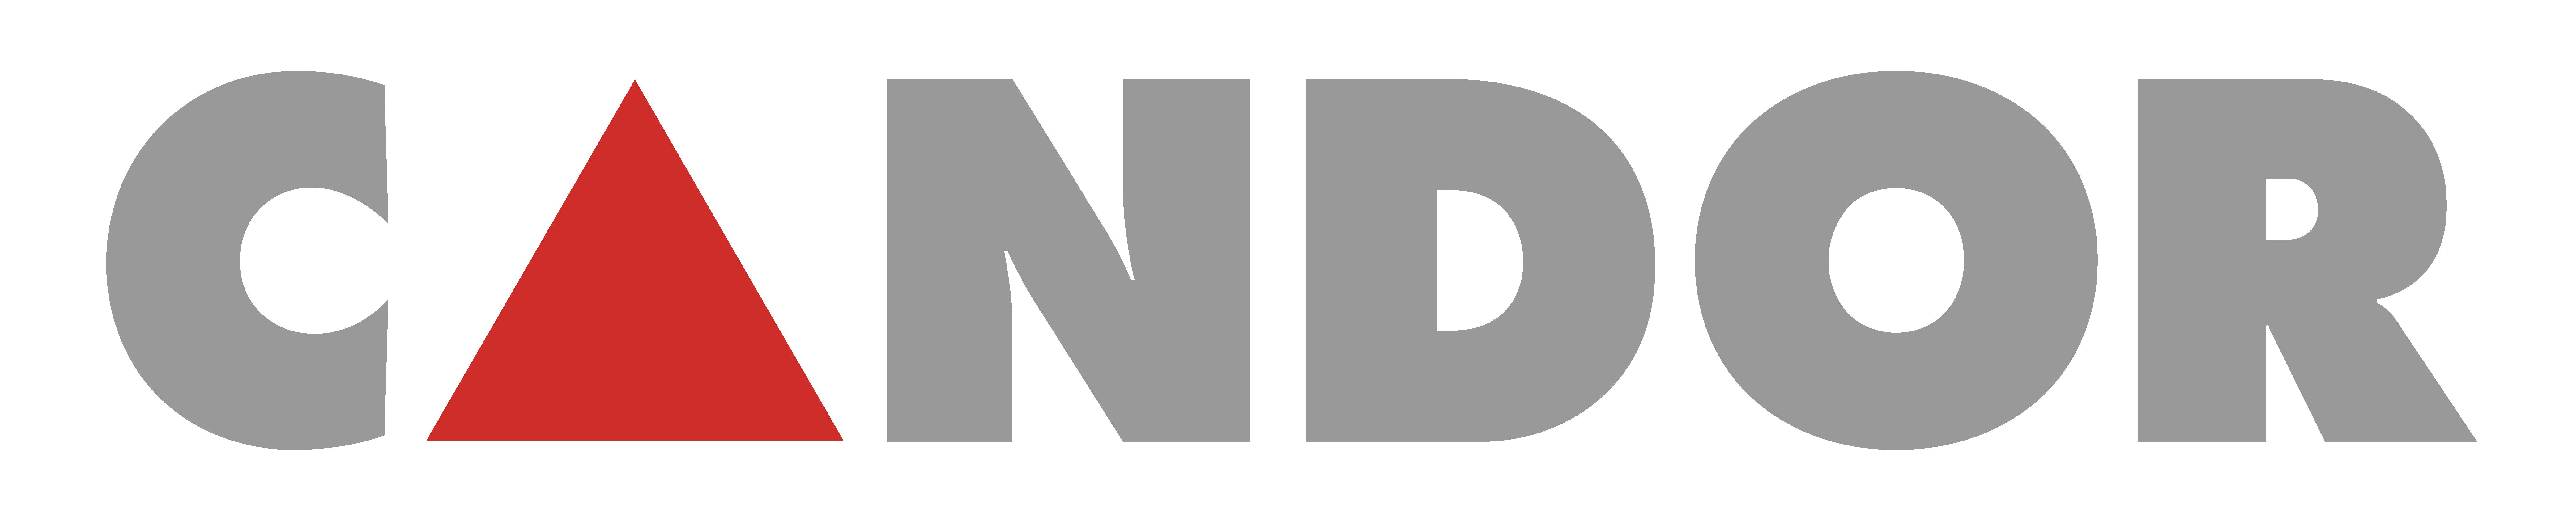 Candor GmbH